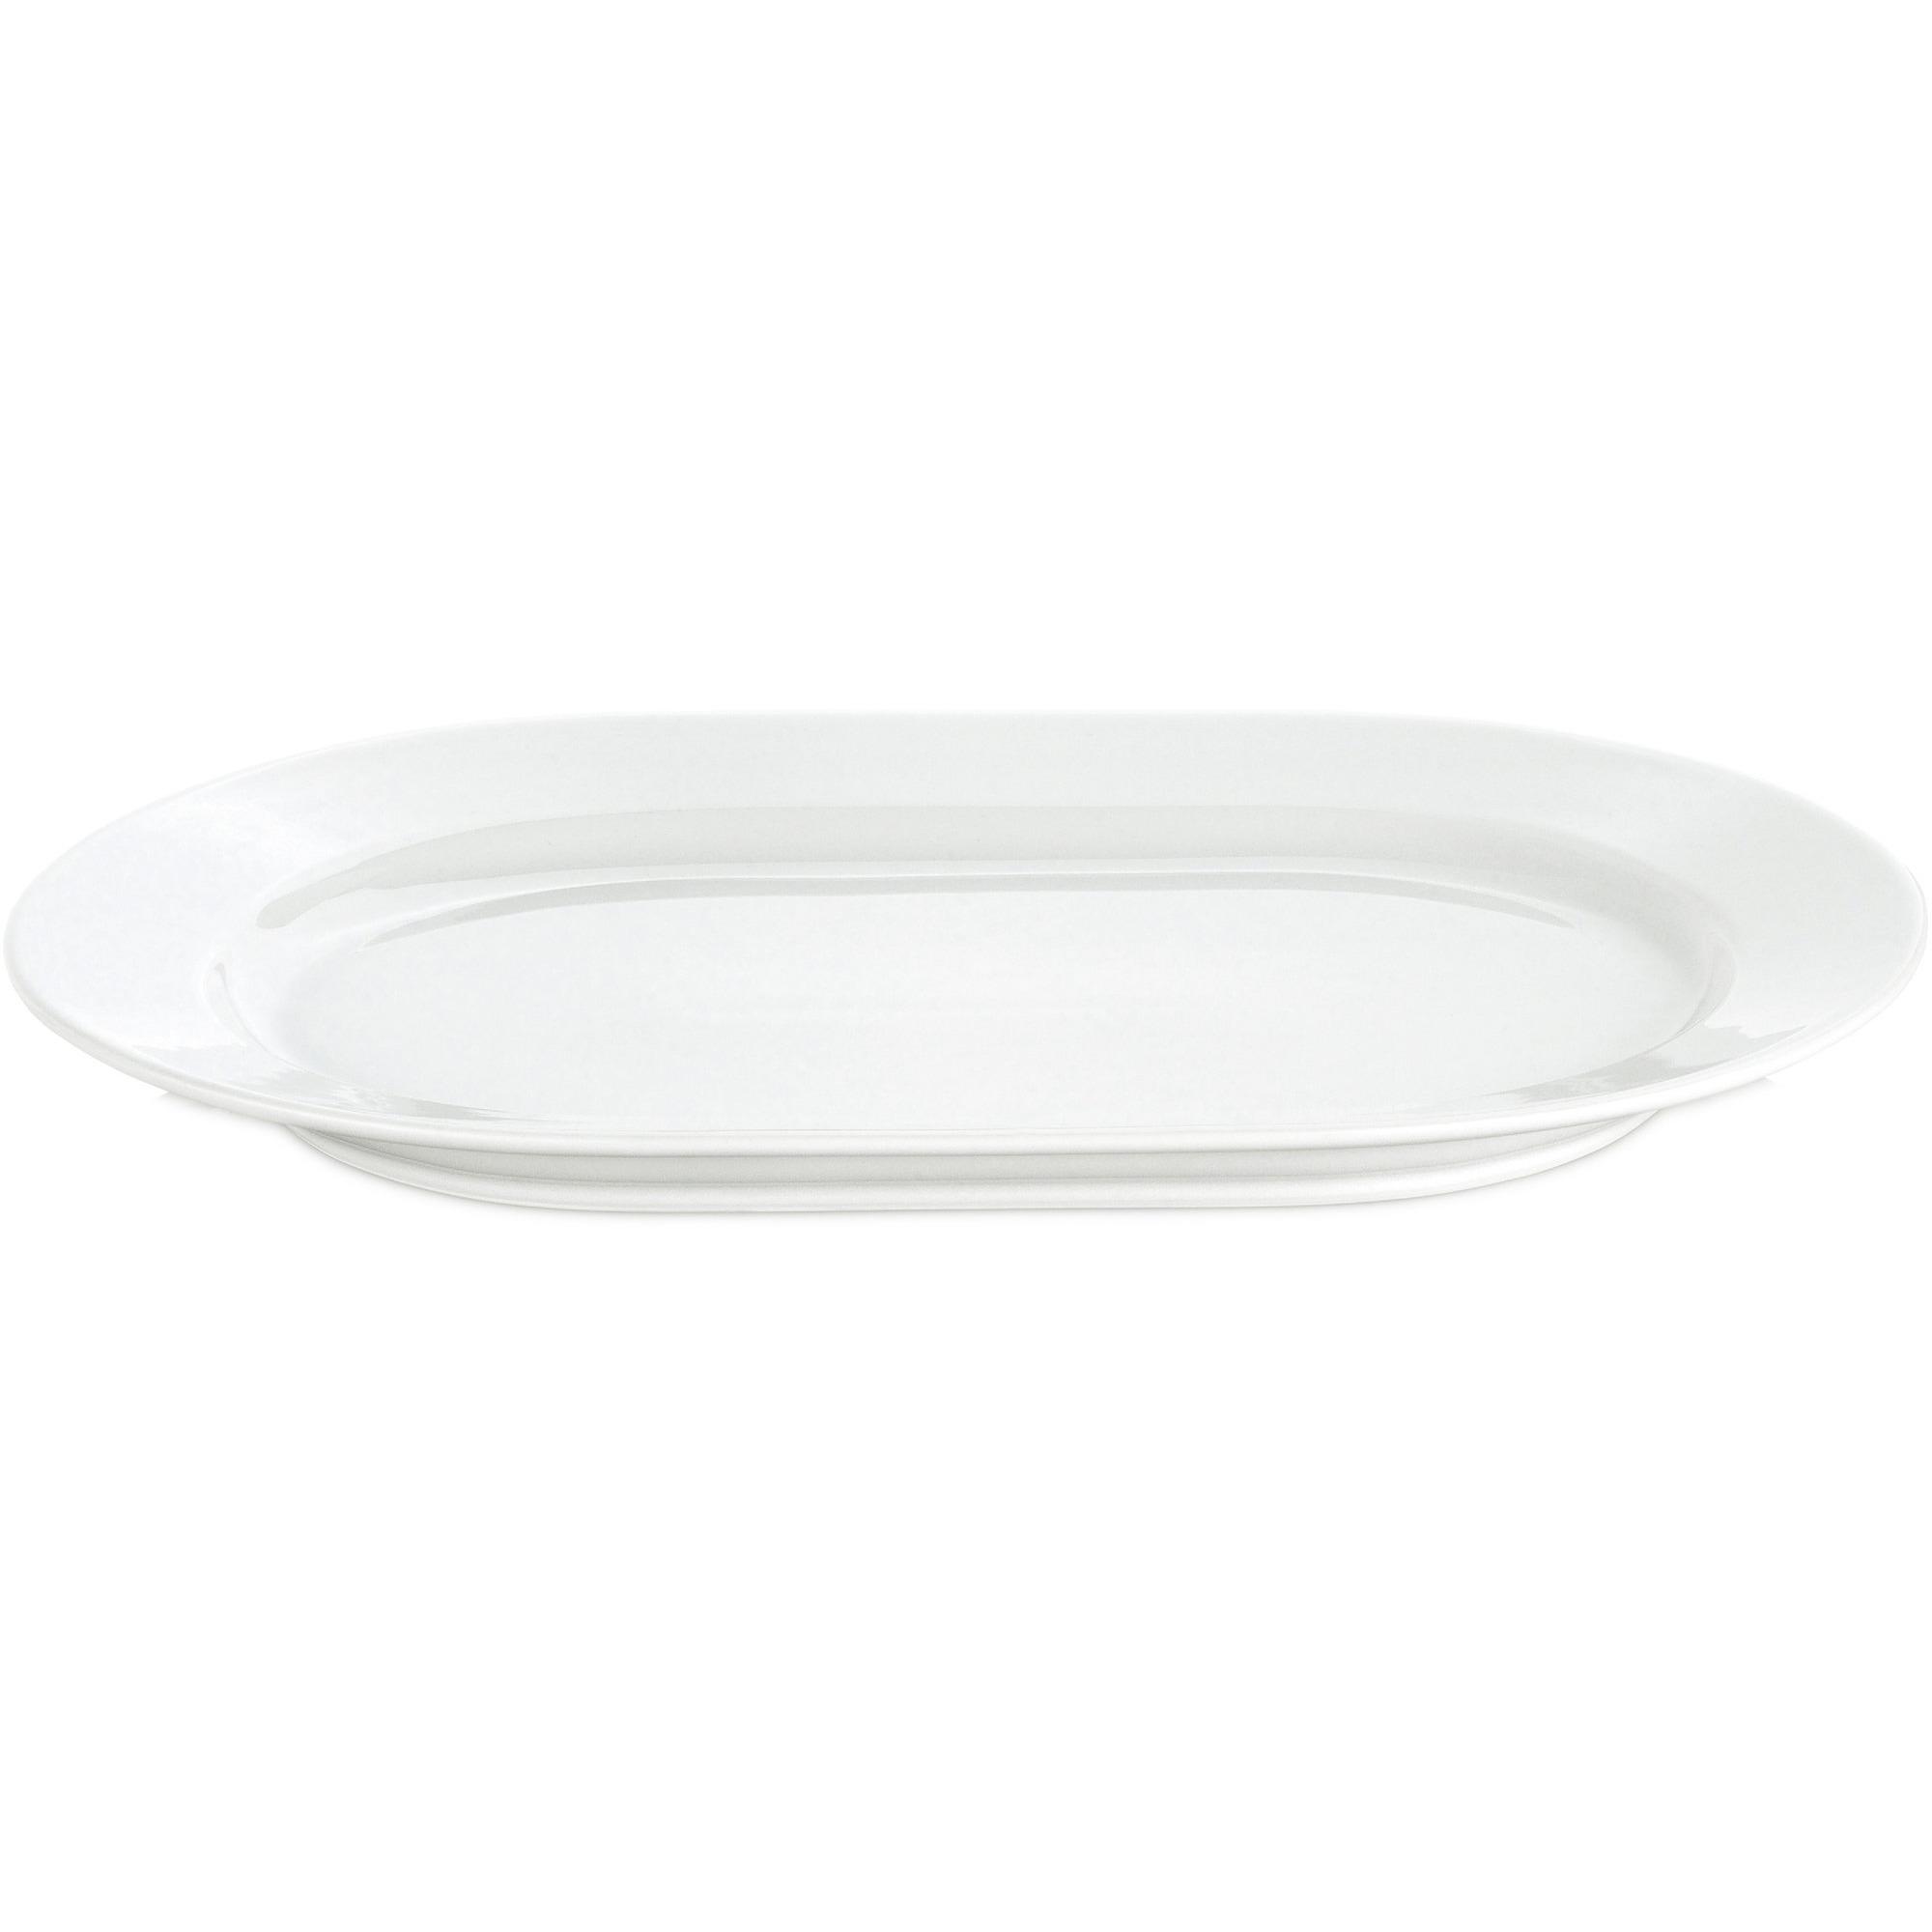 Pillivuyt Sancerre ovalt serveringsfat